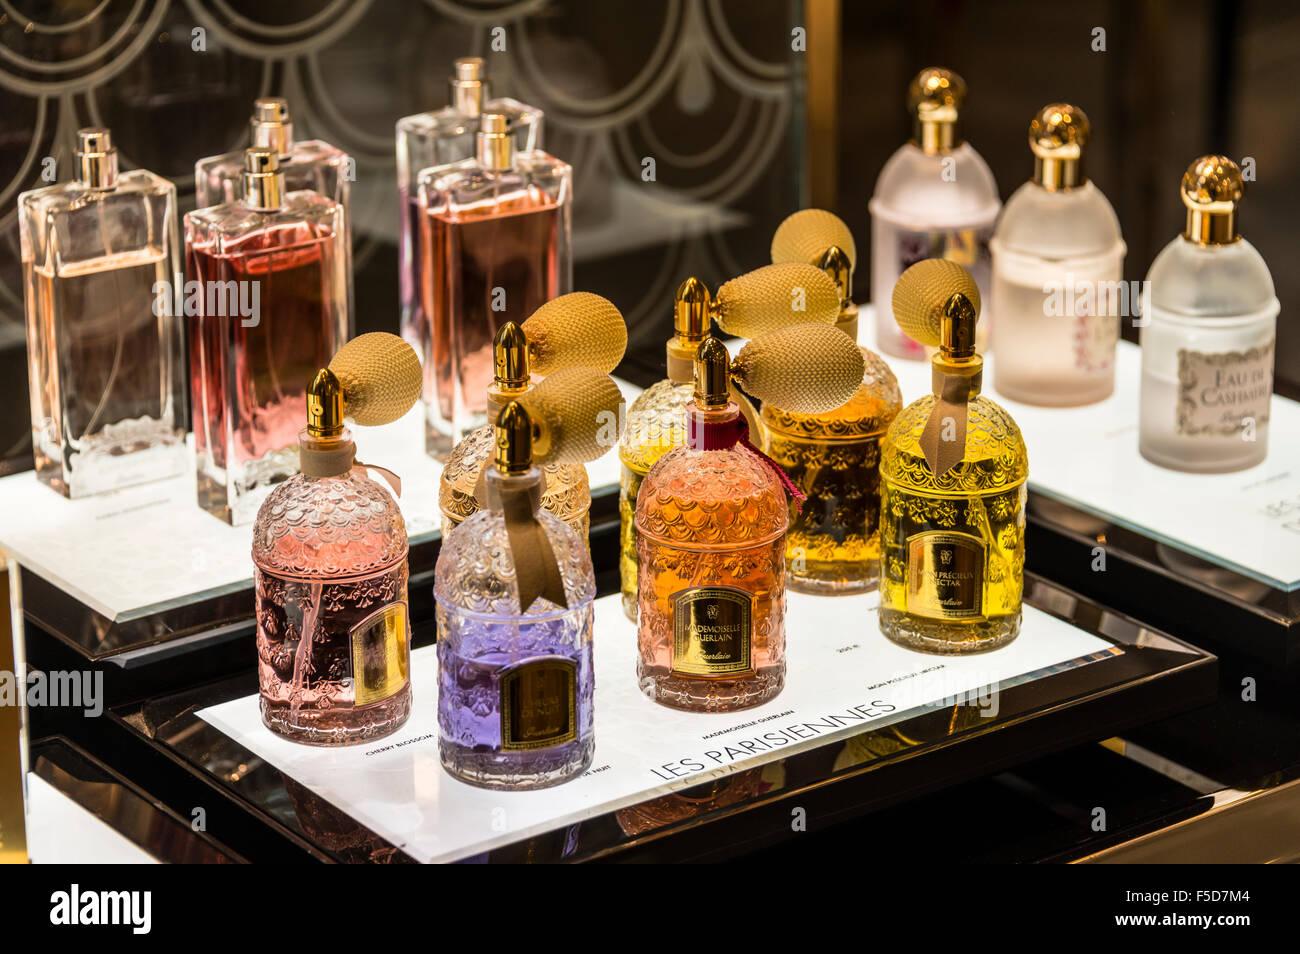 Perfume bottles on display for sale, Galeries Lafayette, Paris, Ile-de-France, France - Stock Image